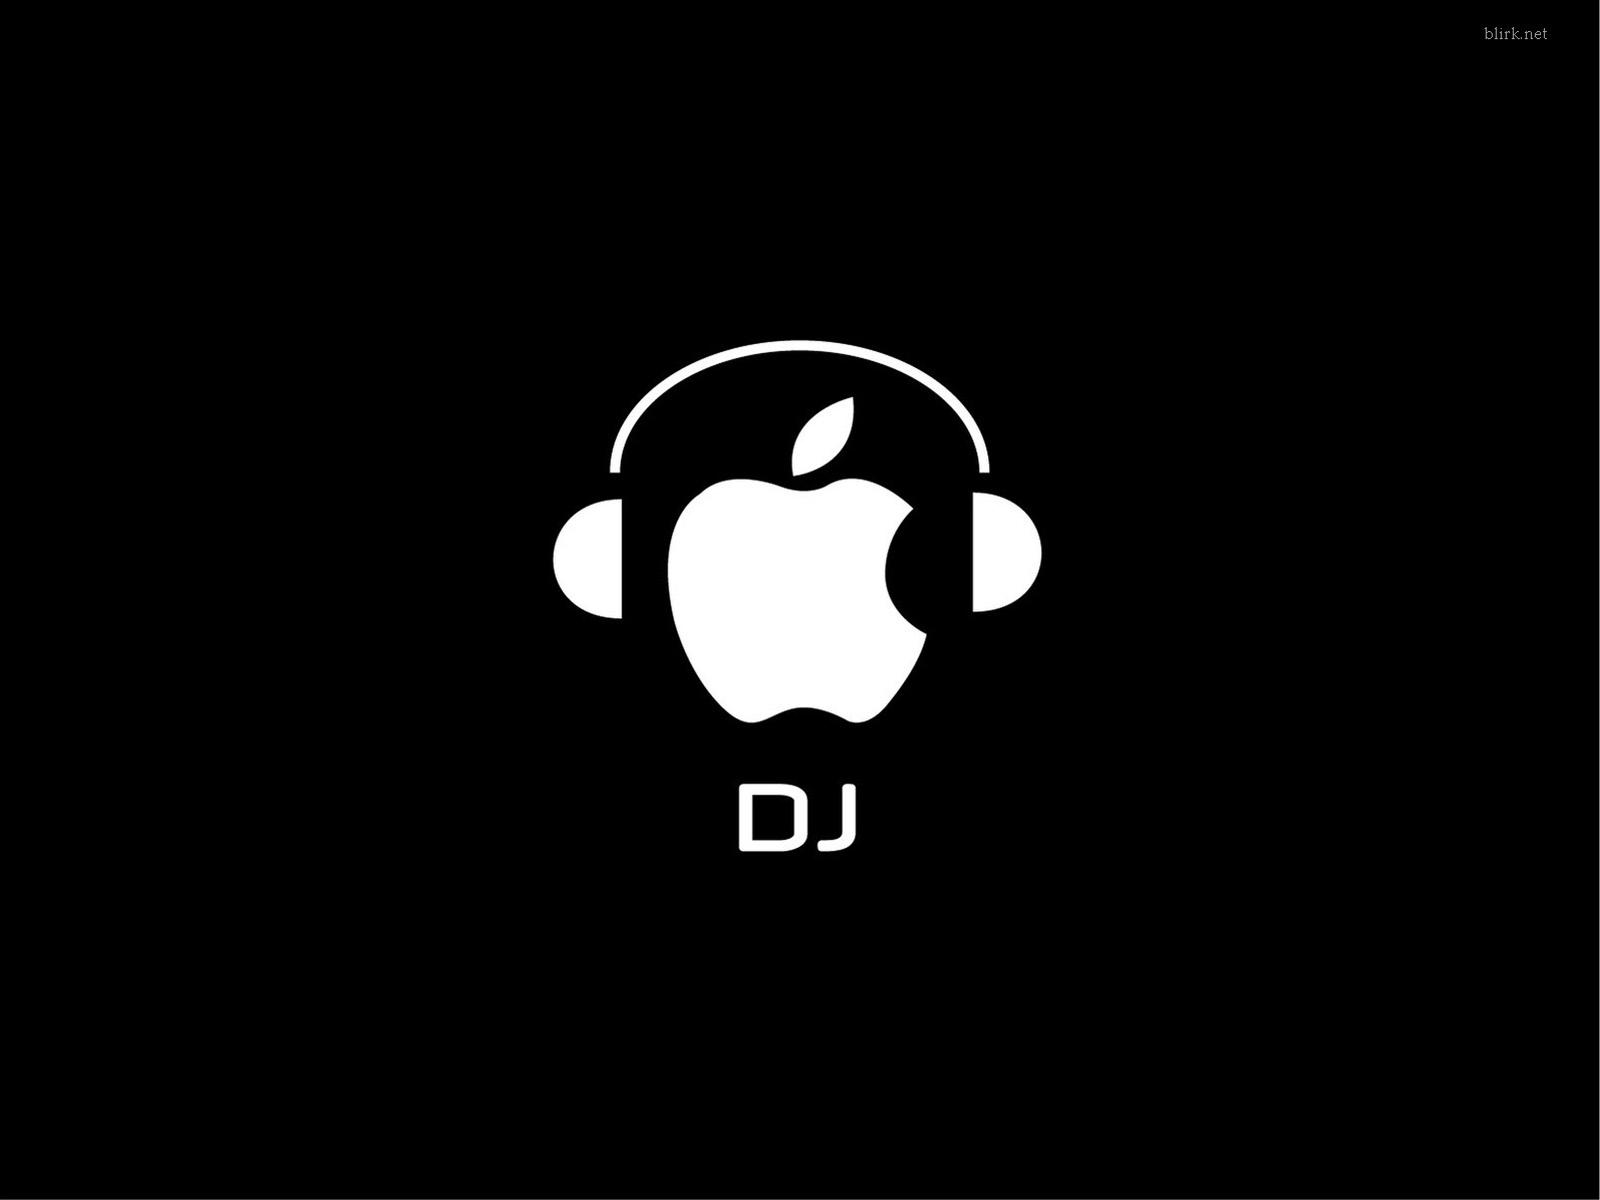 DJ Black Wallpaper Downloads